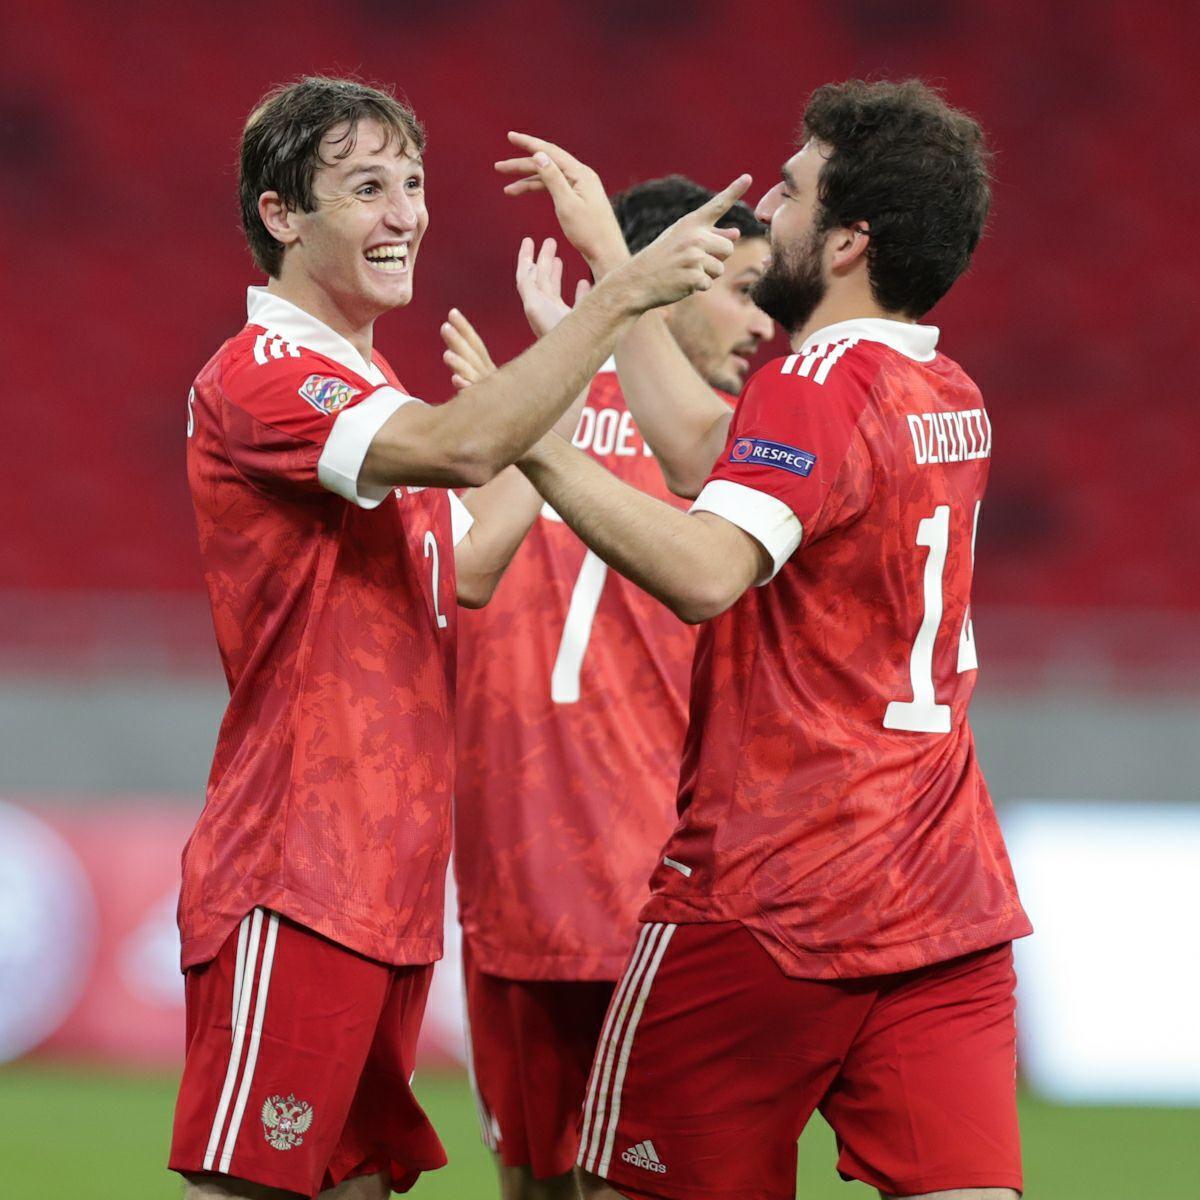 Фото с матча россия венгрия